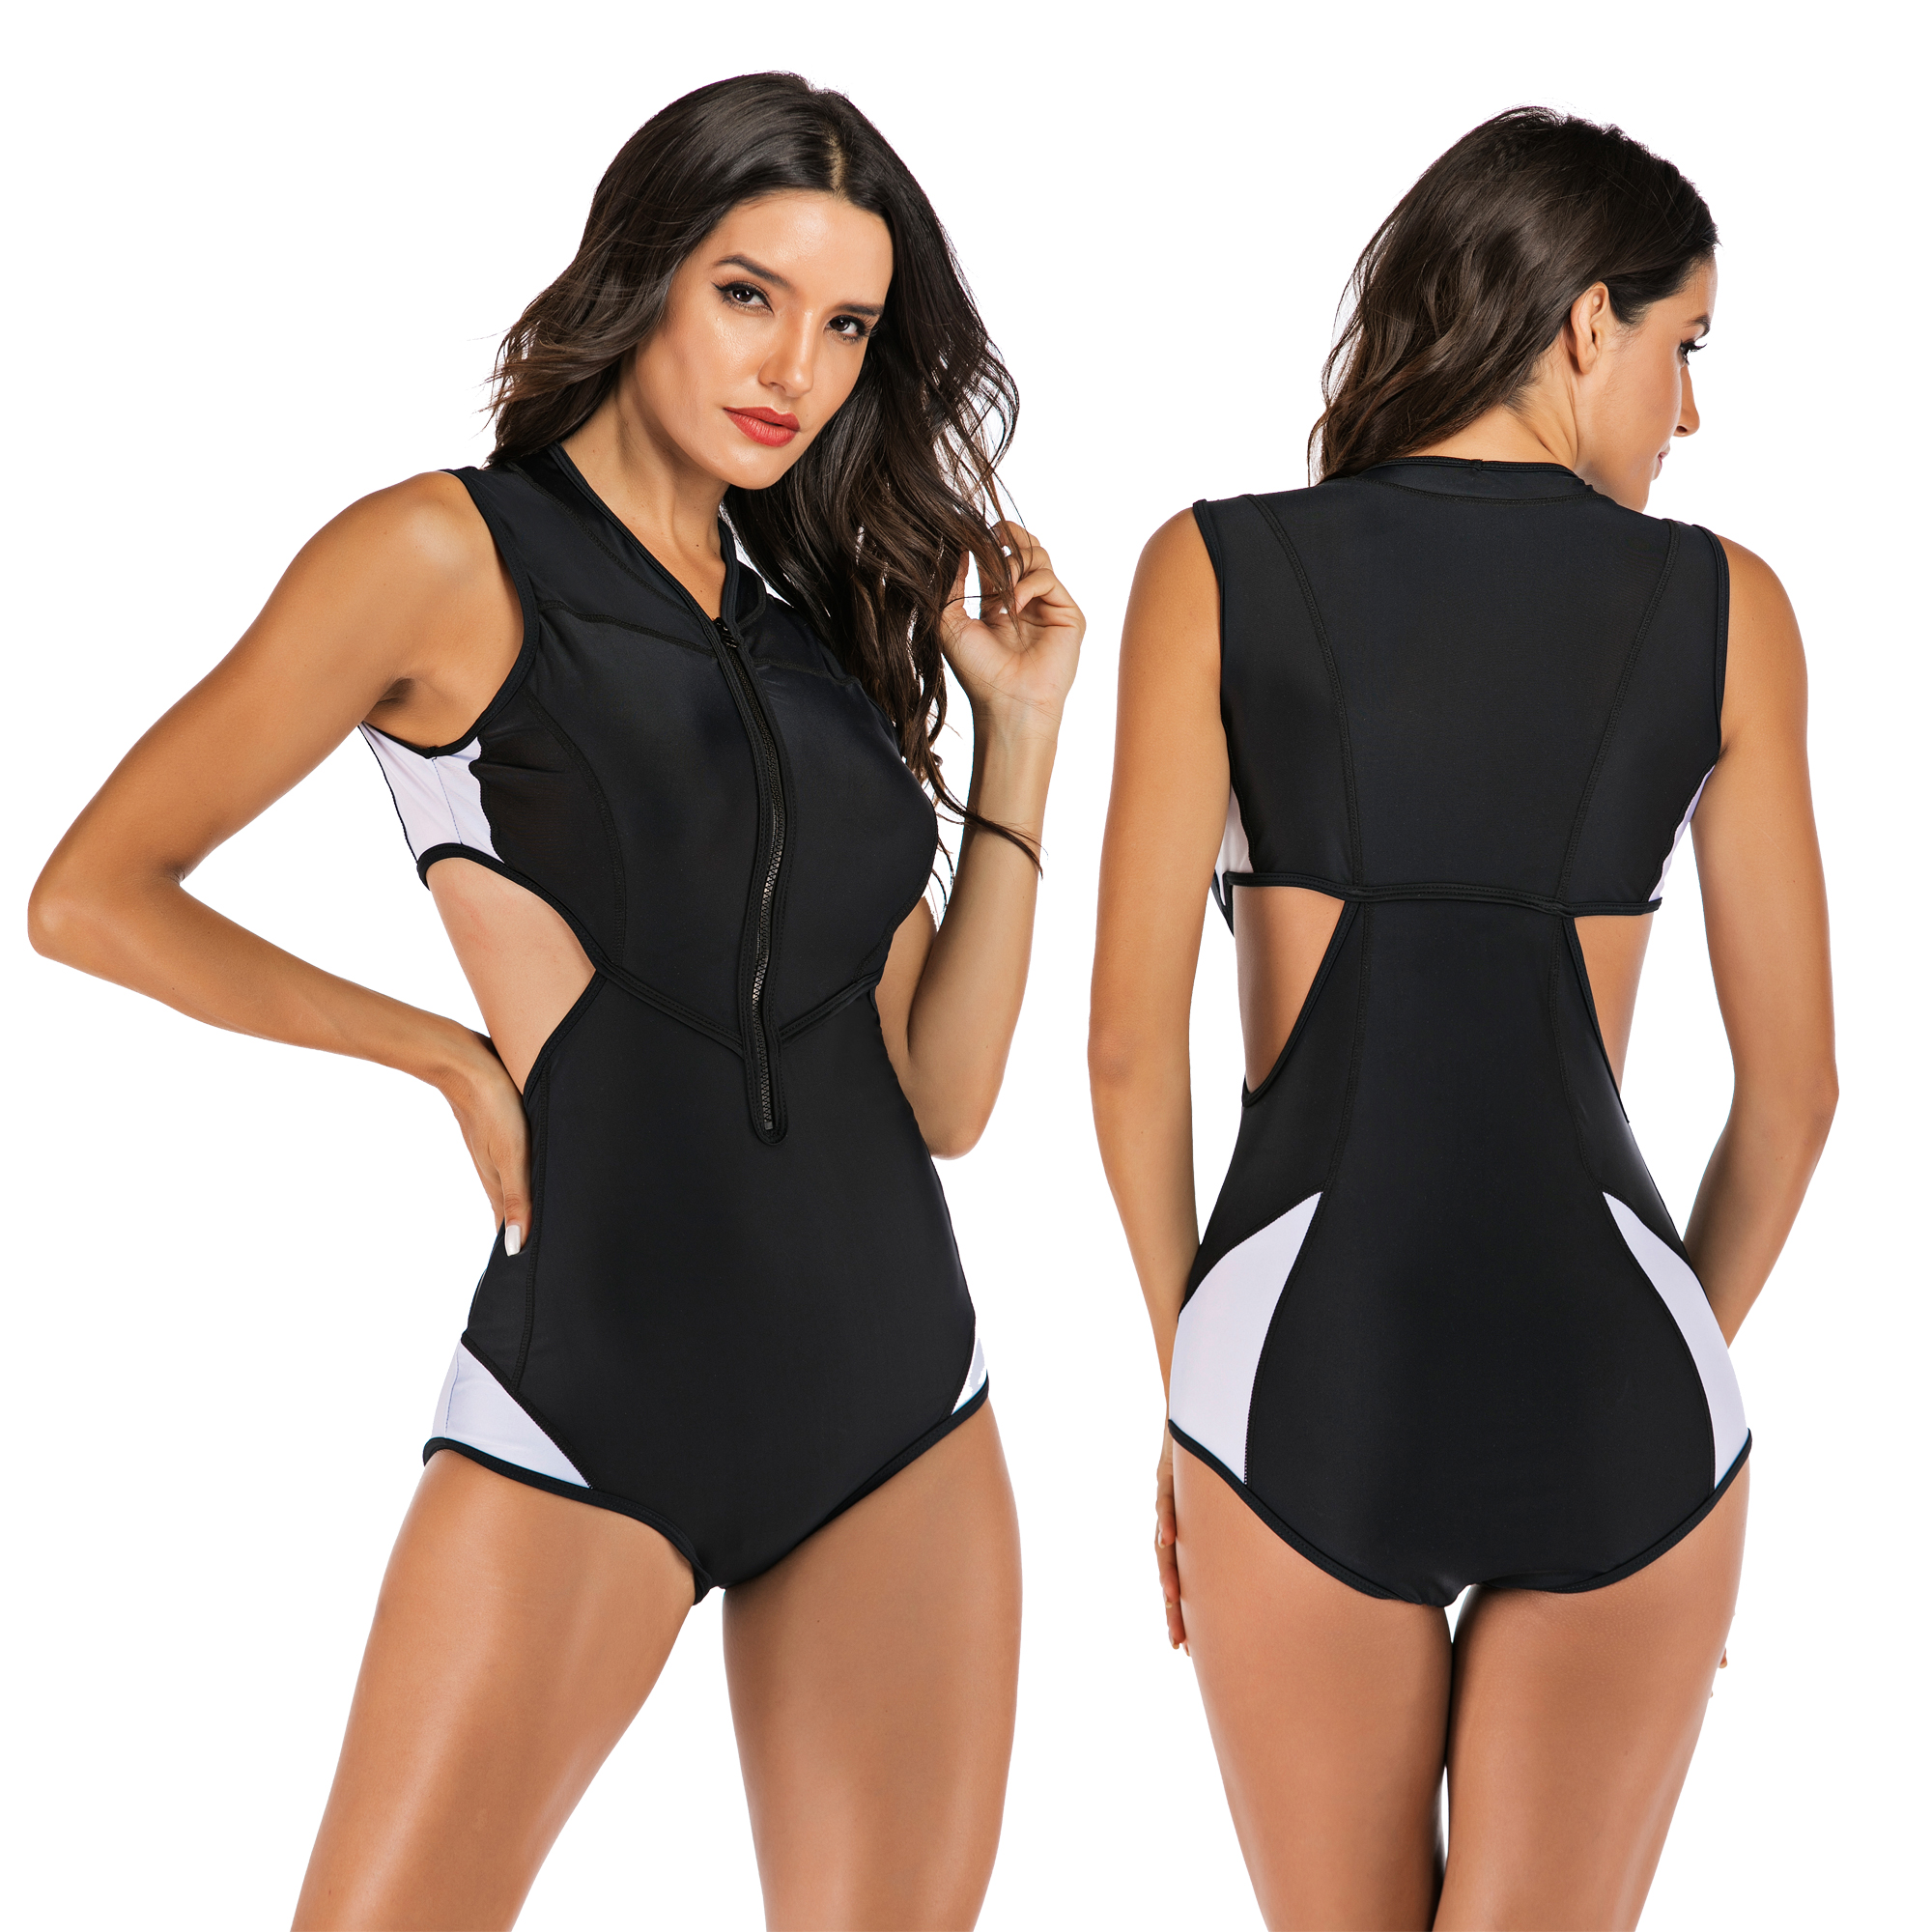 H1ec4f137190c40f49c4e5585fc5ca8f88 Sexy Swimwear Women micro bikini mujer Swimsuit Women swimming suit Bikinis Set Vintage Beach biquinis feminino